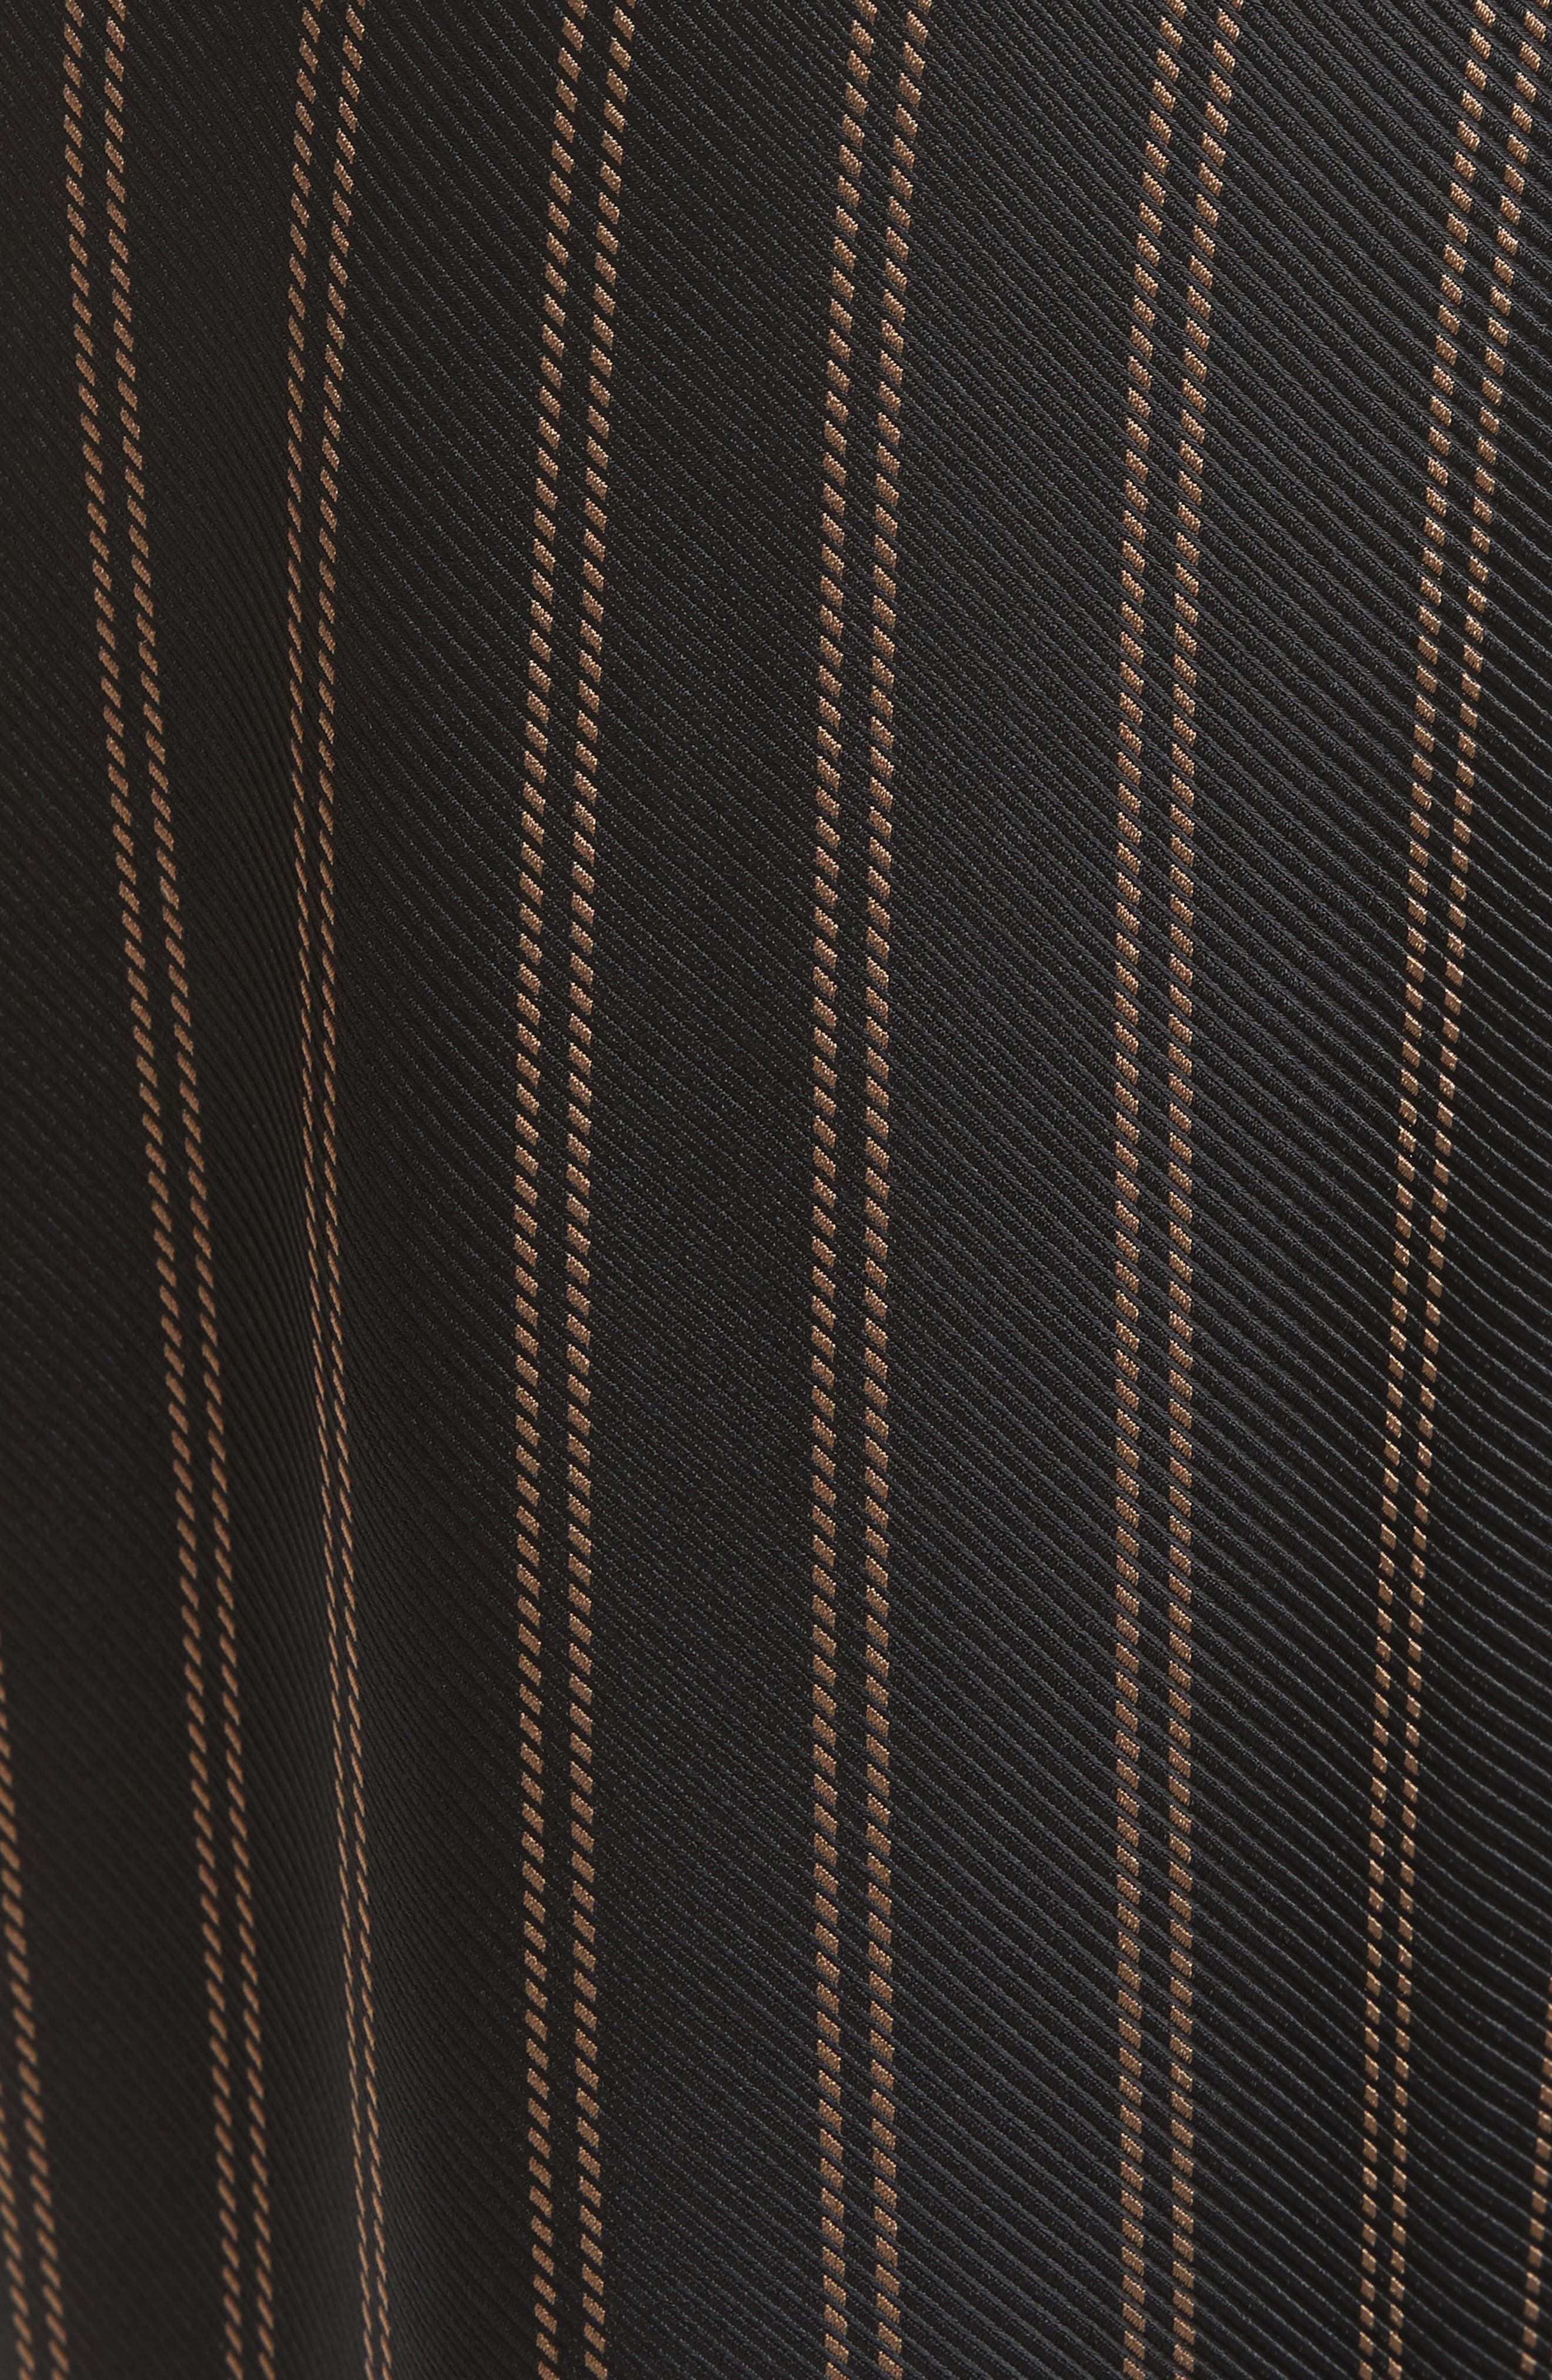 Belted Pleat Crop Pants,                             Alternate thumbnail 6, color,                             Black/ Tan